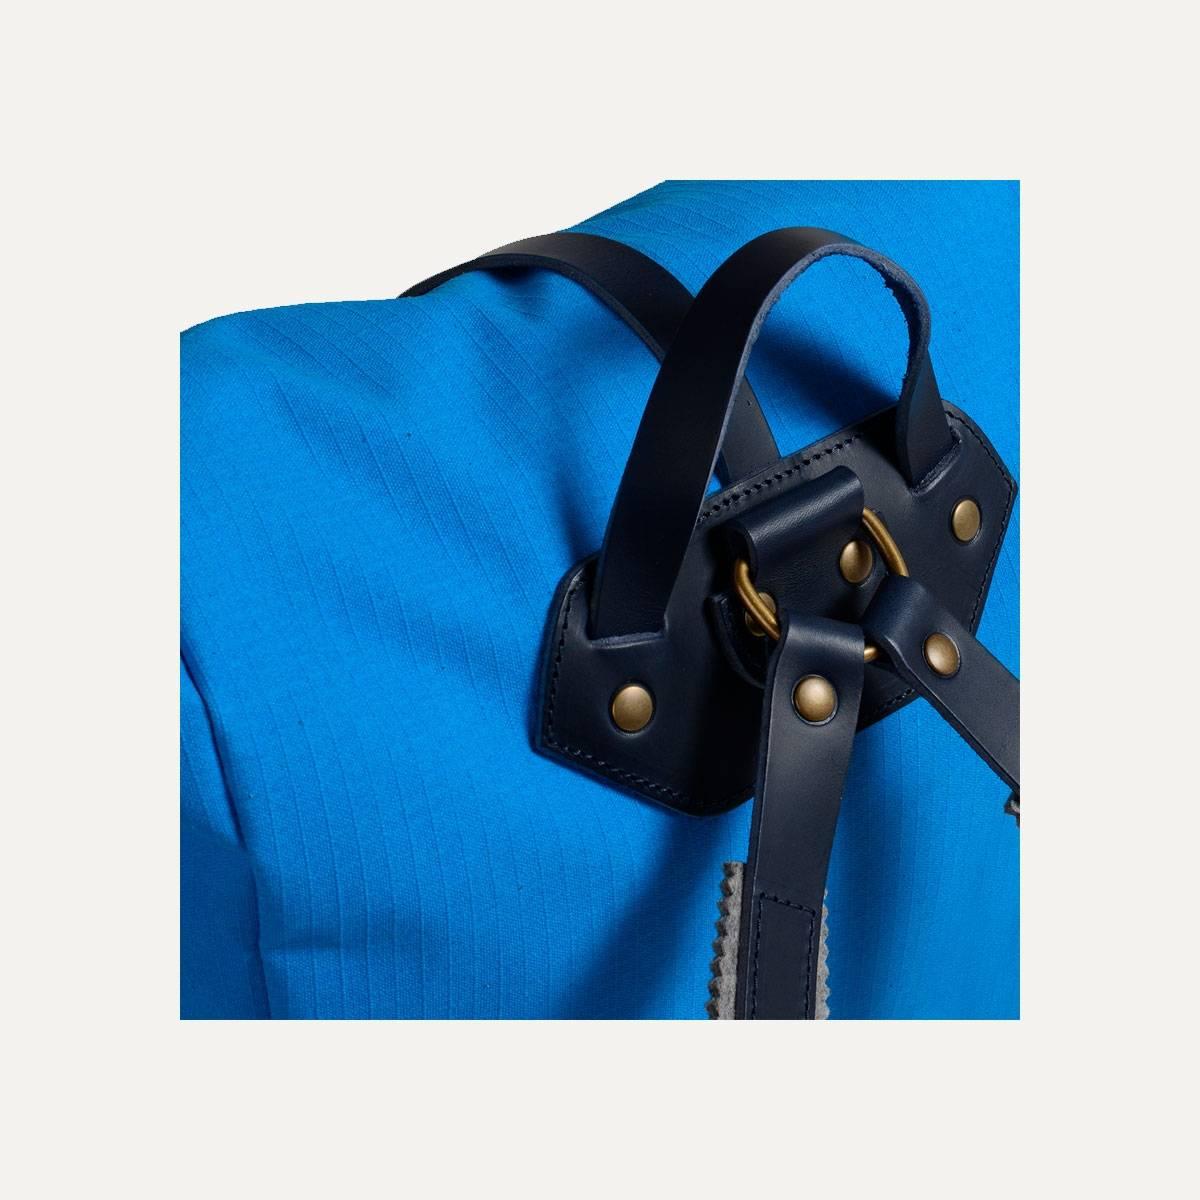 Jamy Backpack - Regentex Blue (image n°5)